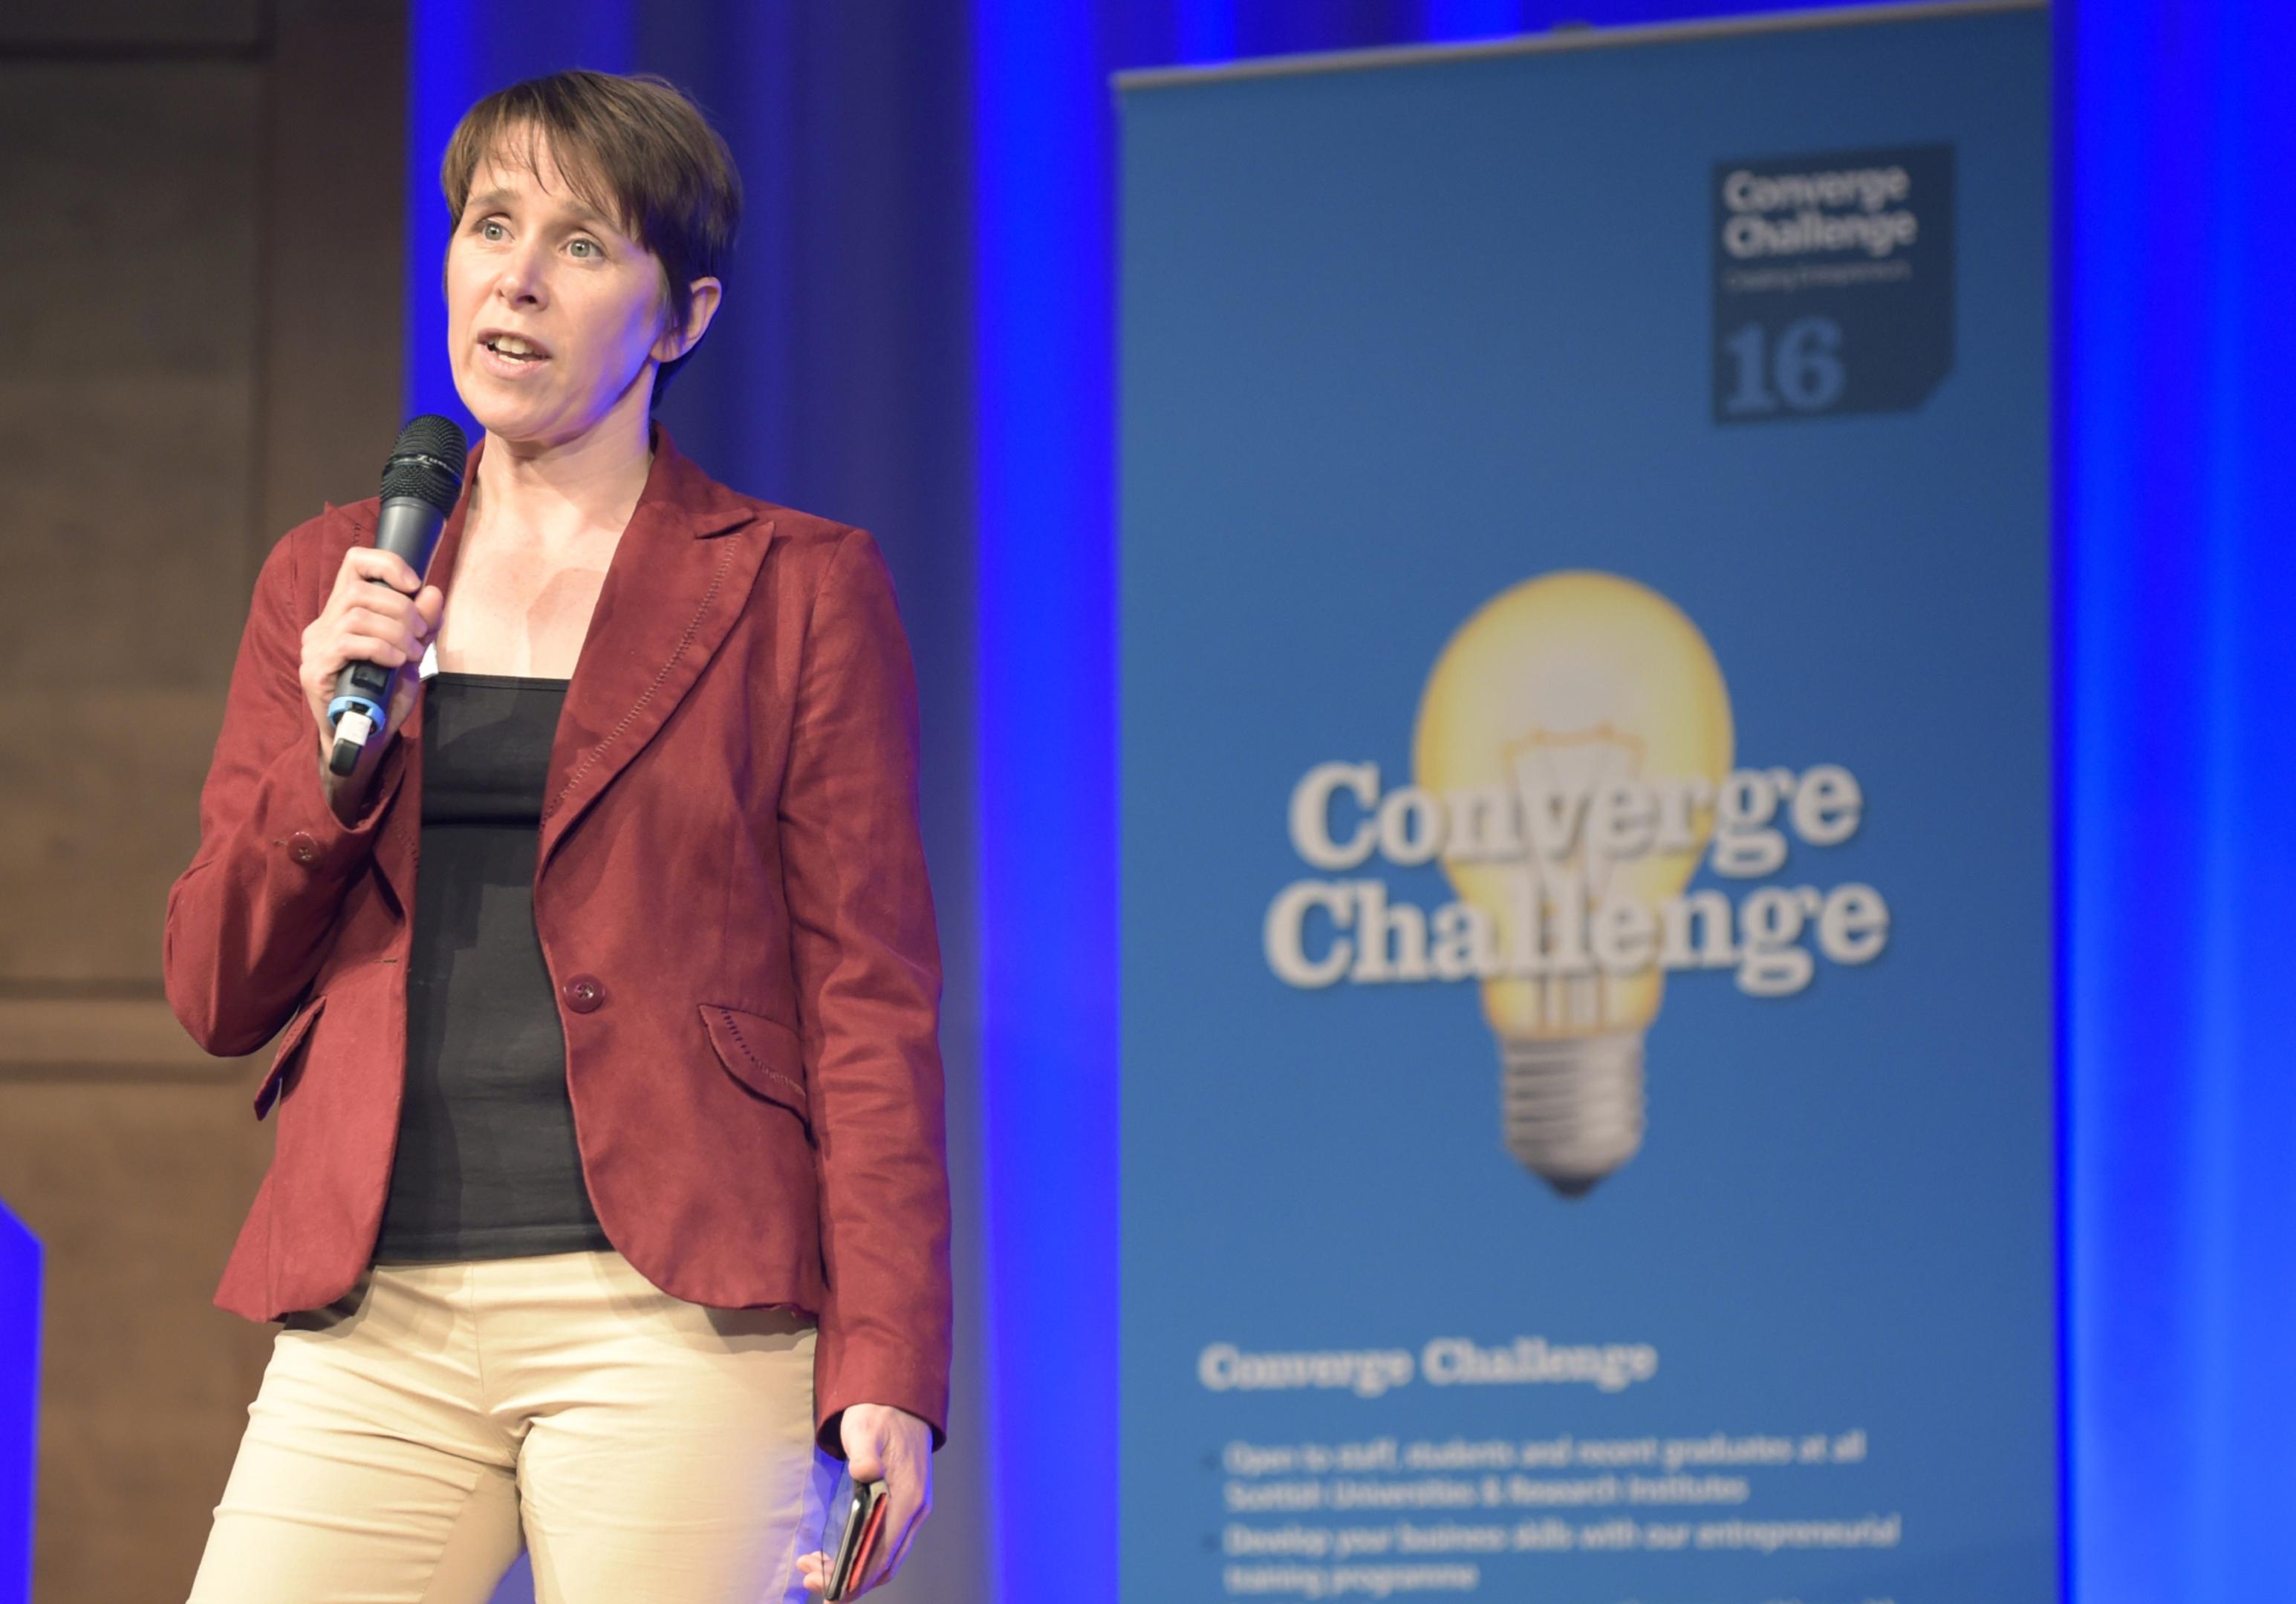 Dr Deborah Wake, Dundee University.